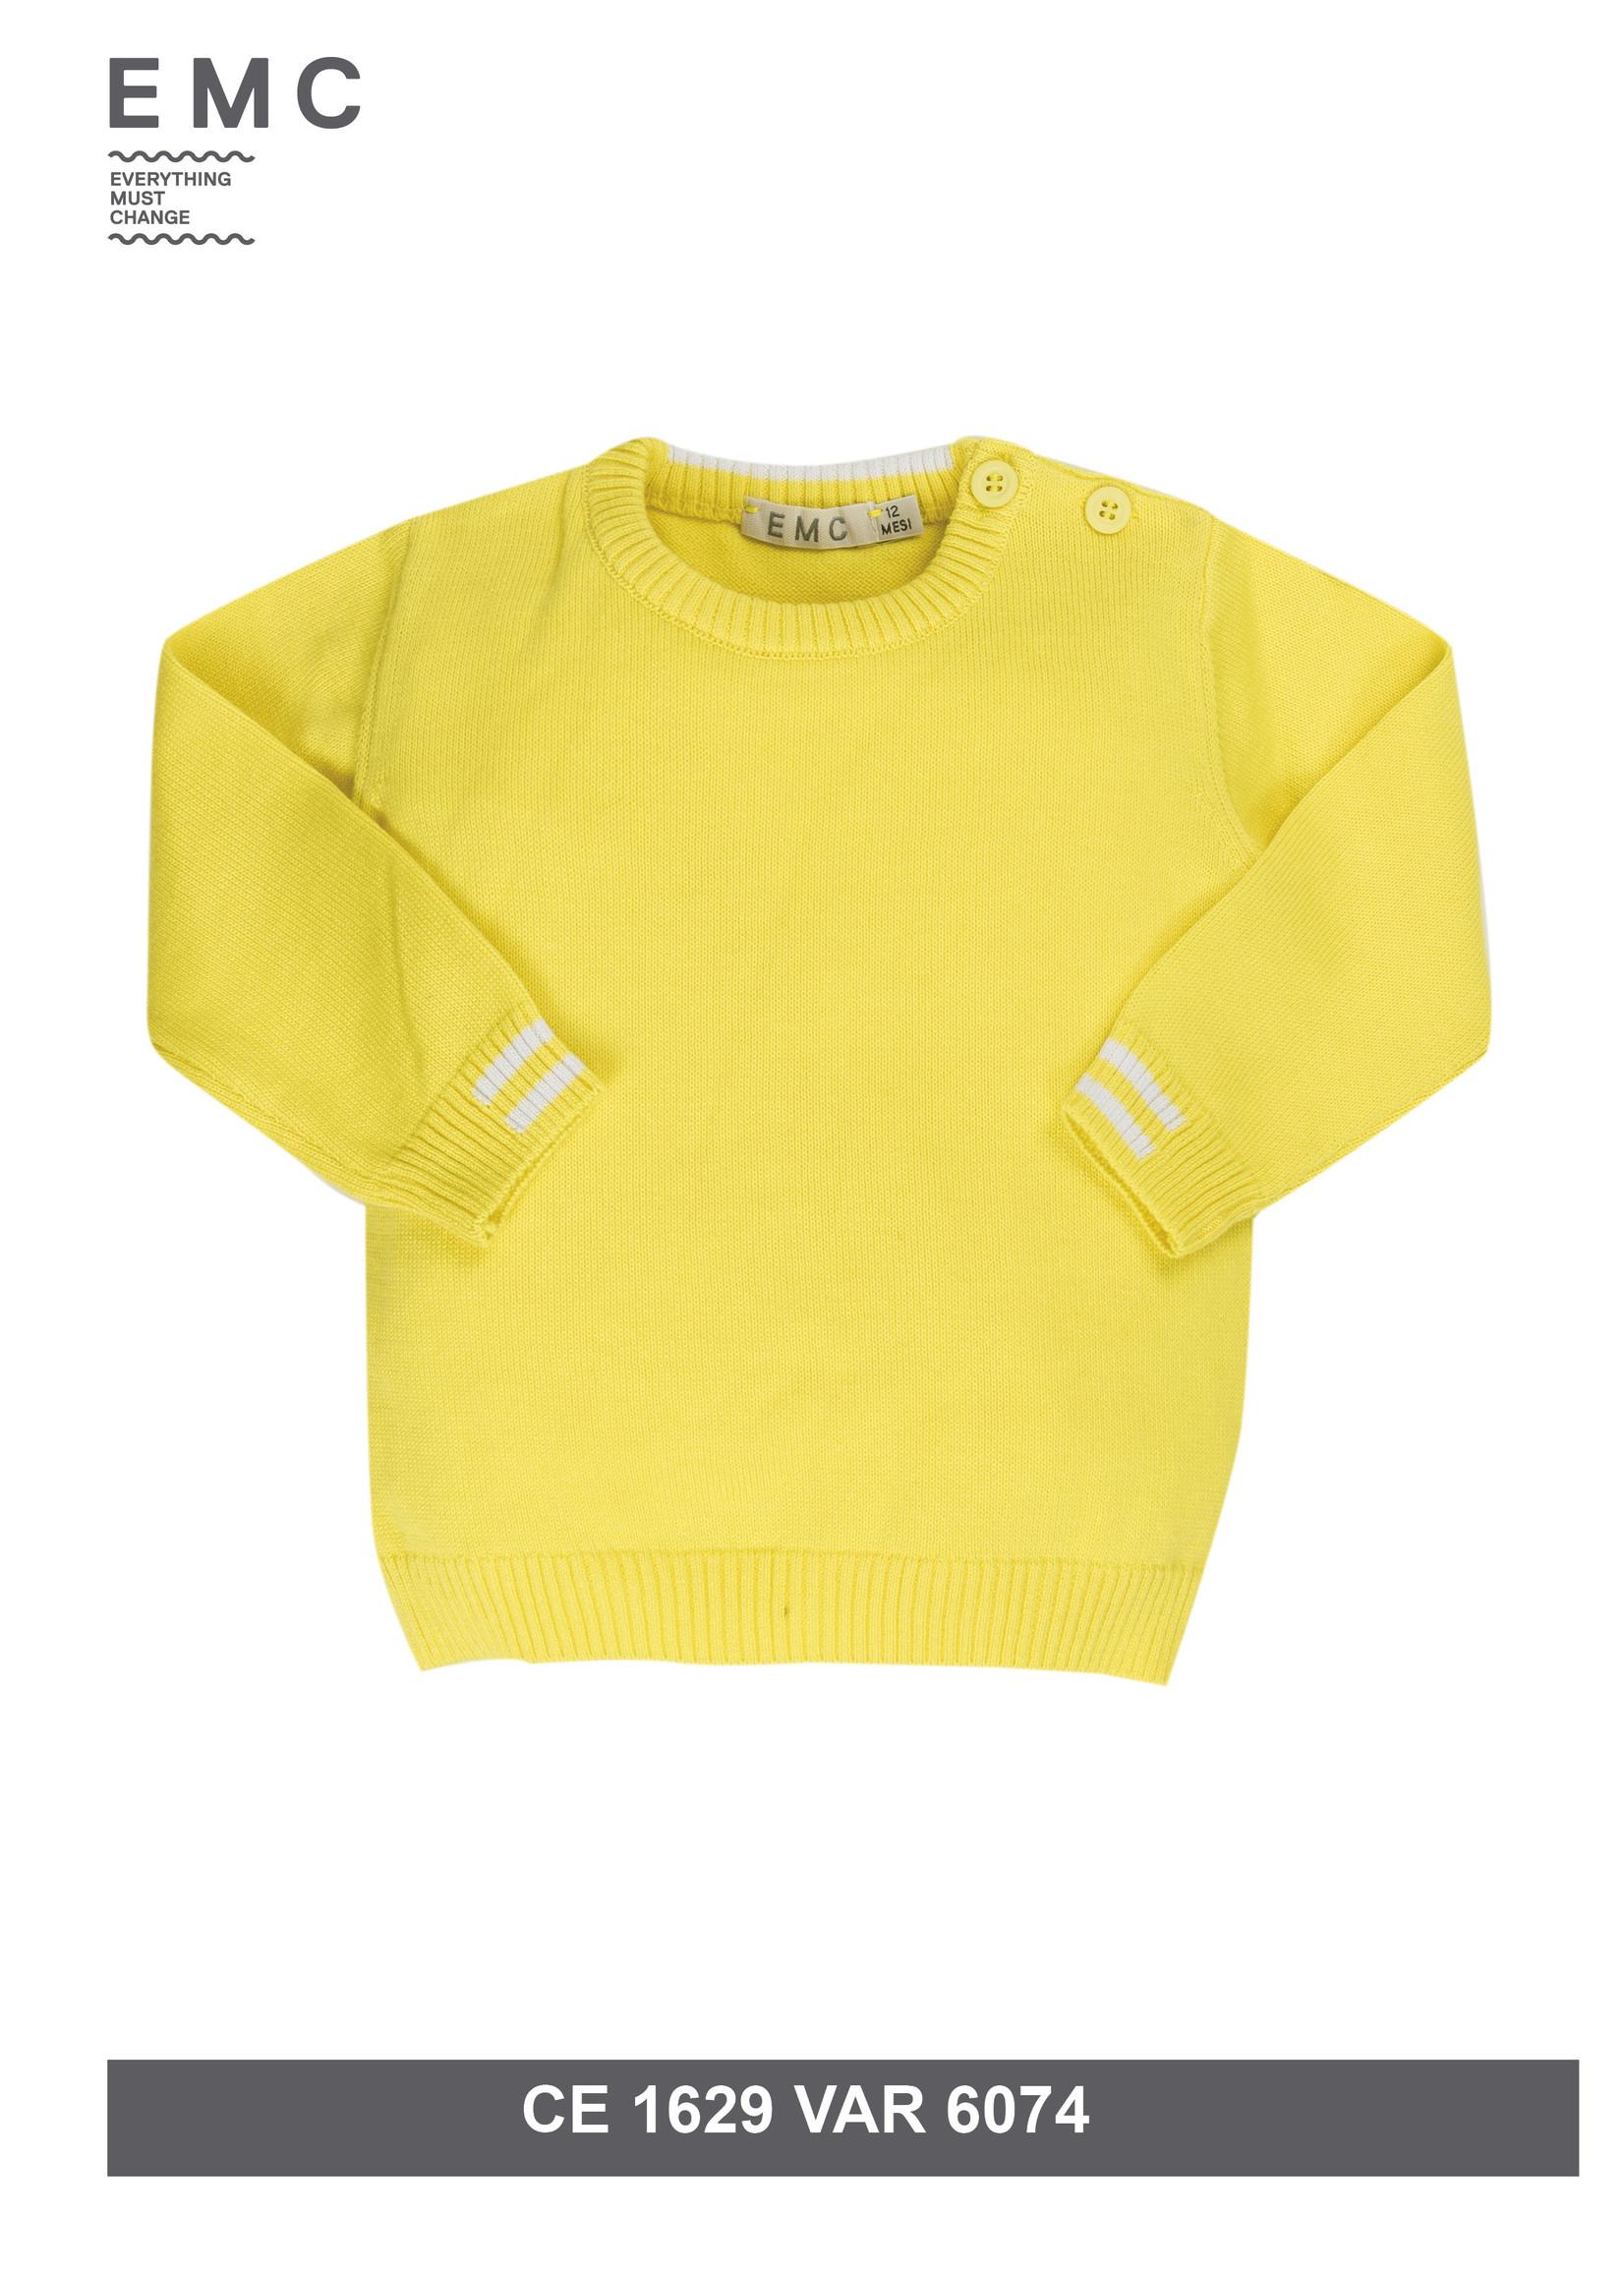 EMC EMC gele sweater